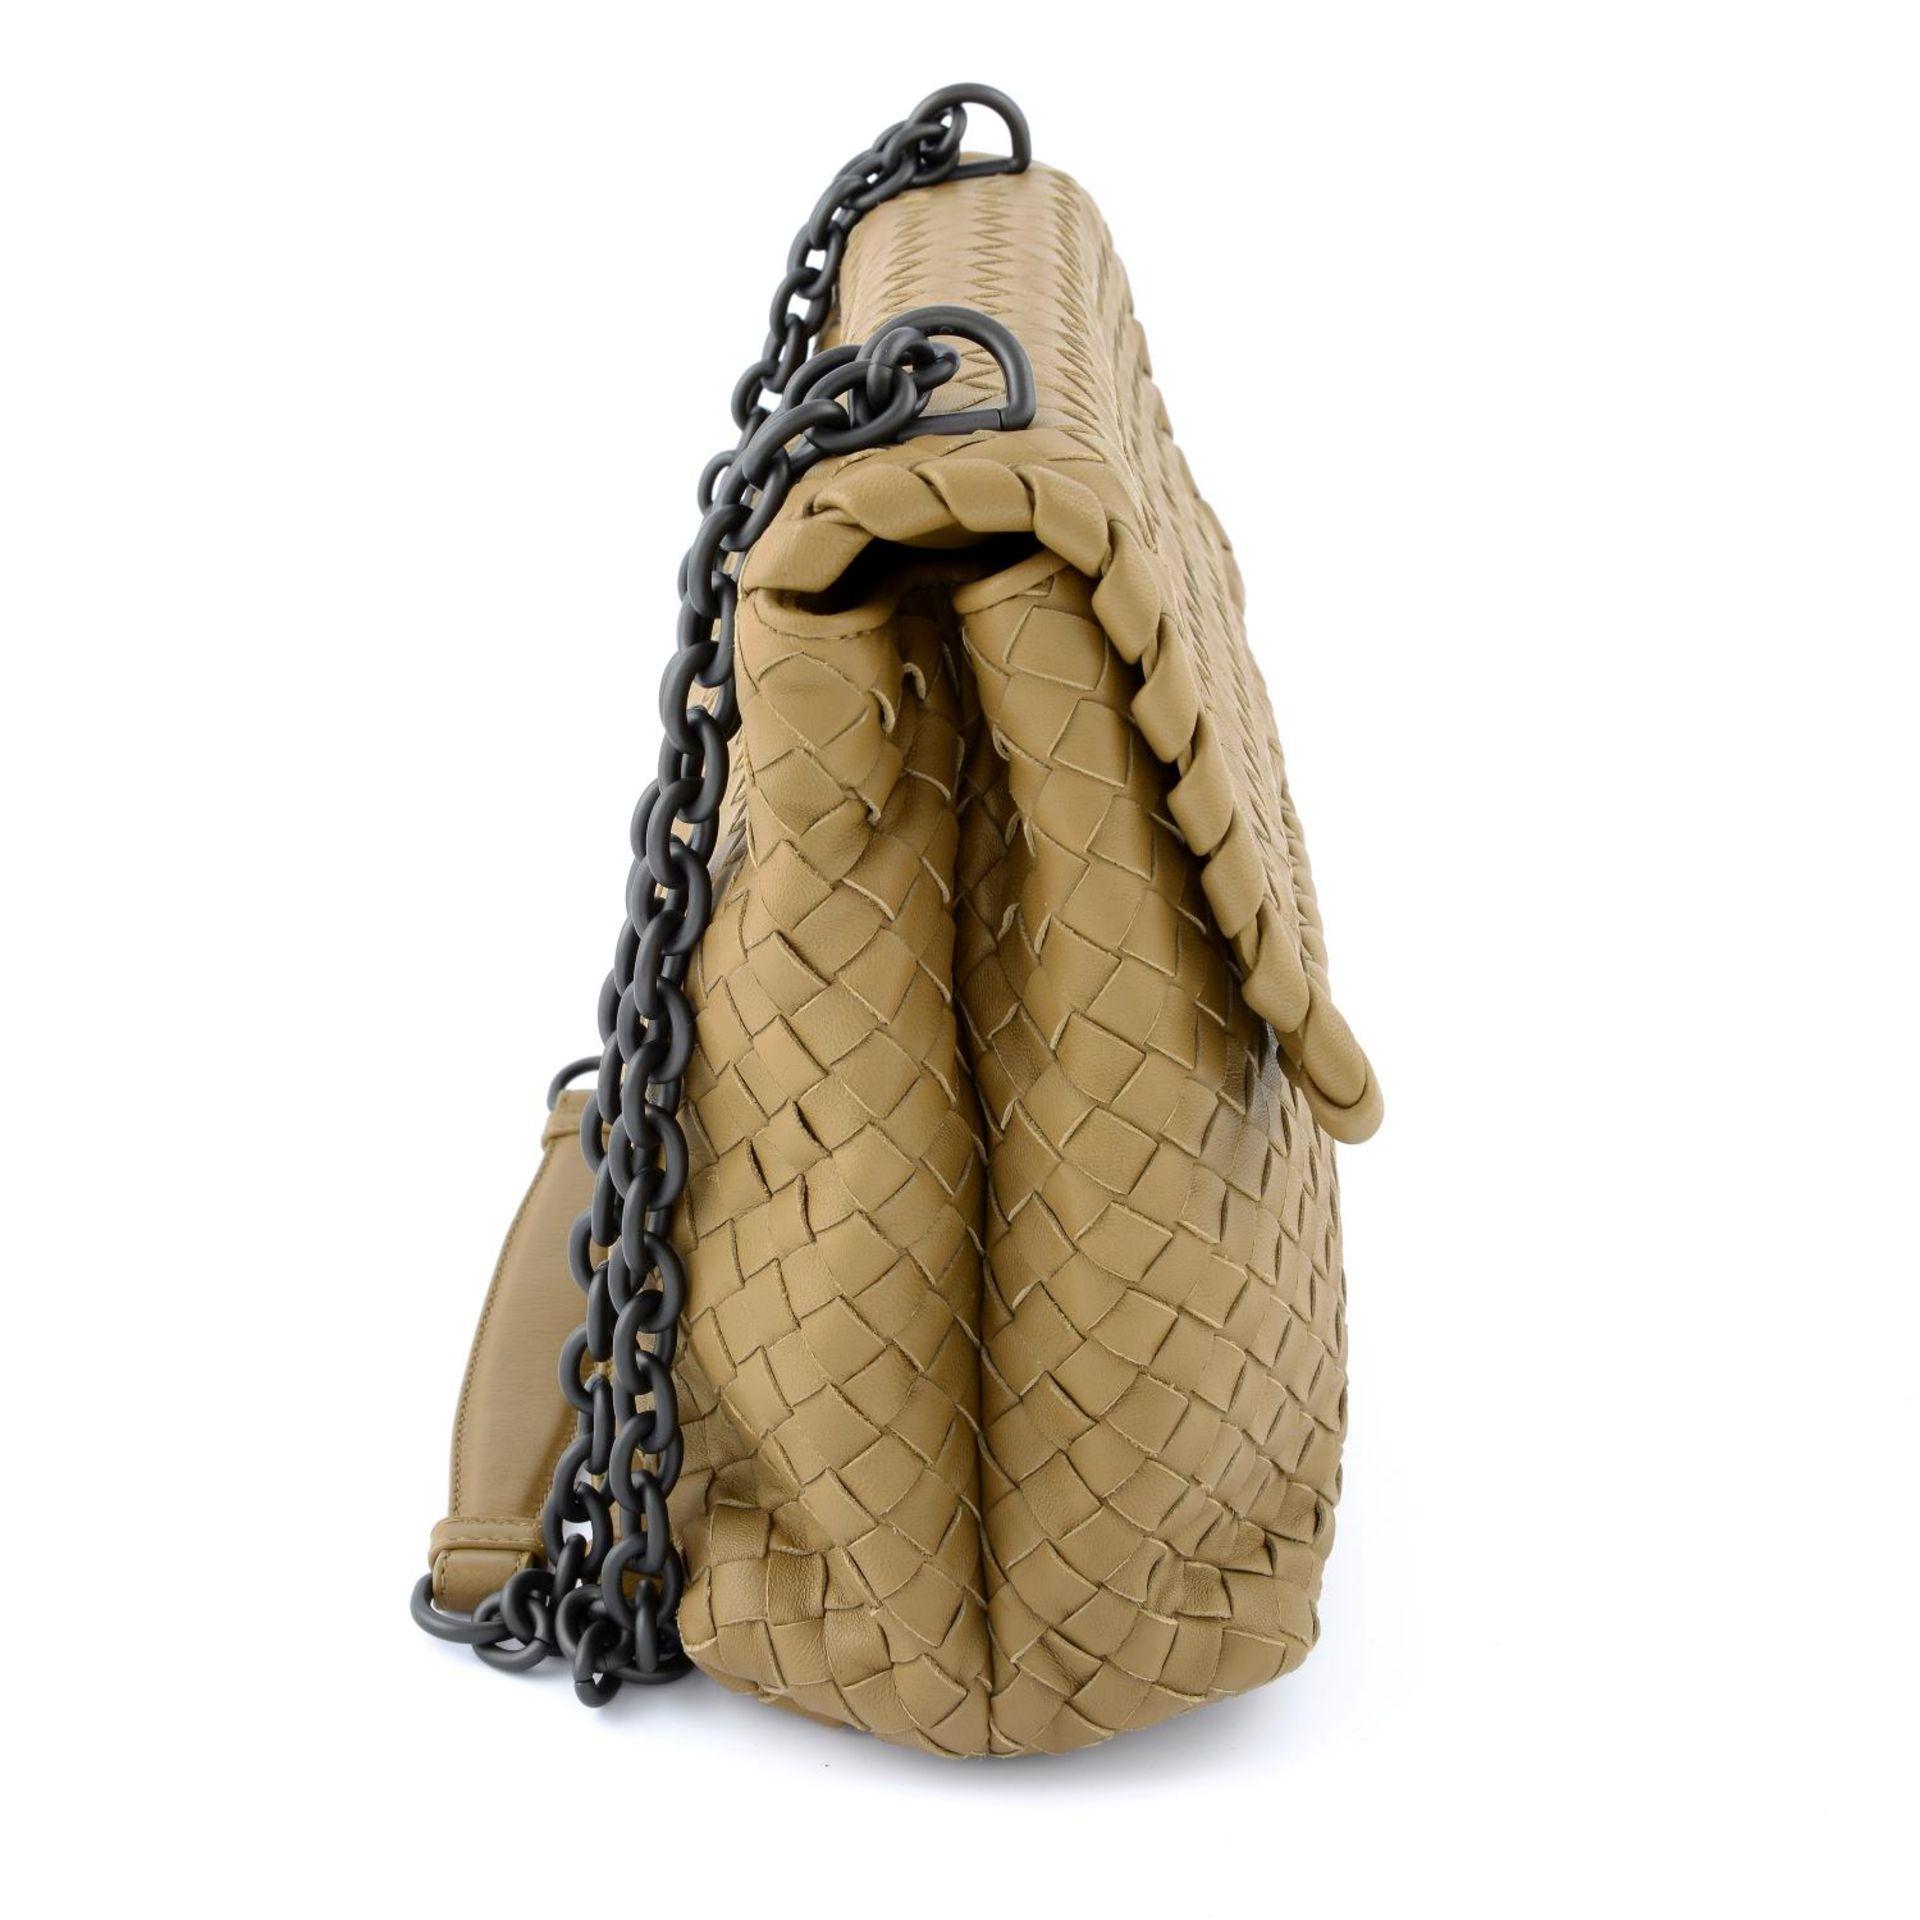 BOTTEGA VENETA - a fold over Intrecciato handbag. - Image 4 of 5